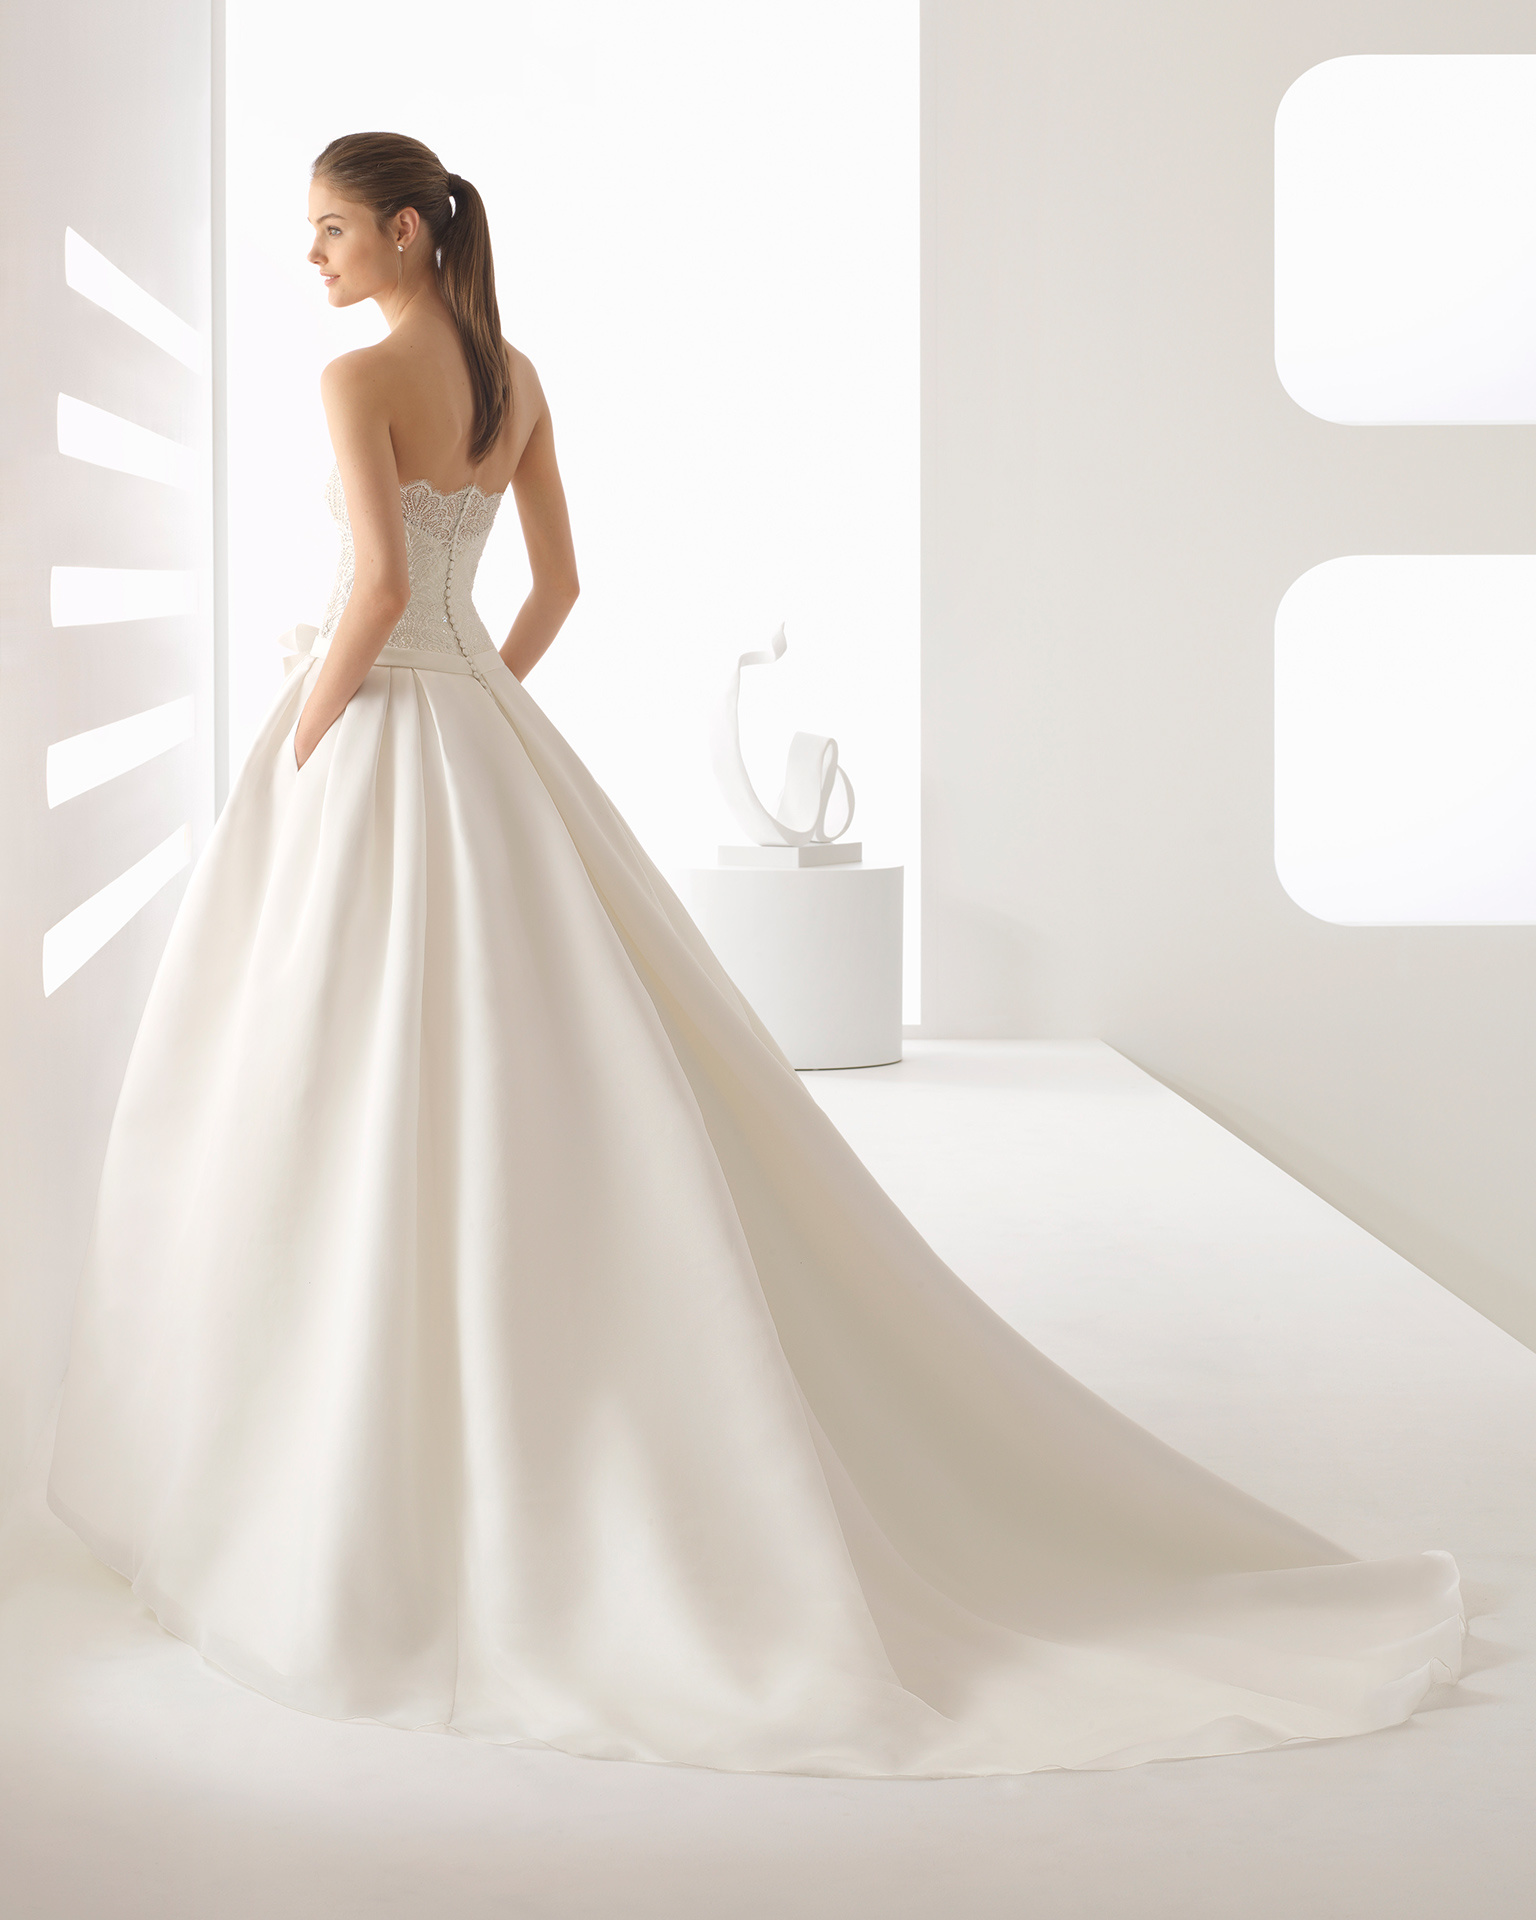 8b5b0f1d9751 Fashion Short Sleeve Bolero Beading Lace Top Organza Skirt with ...